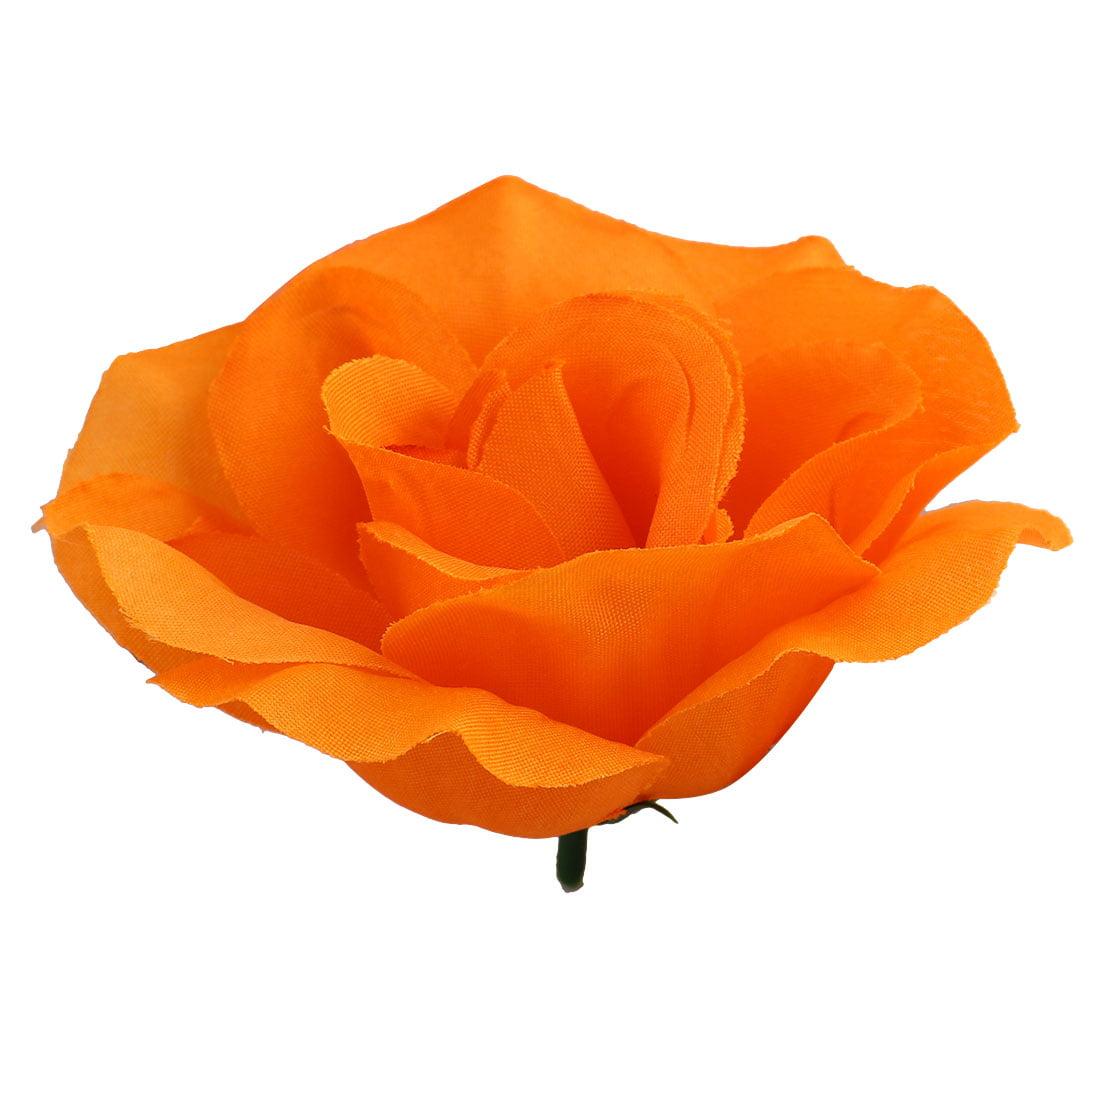 Household Table Handcraft Artificial Fabric Flower Rose Petal Head Decor # 1